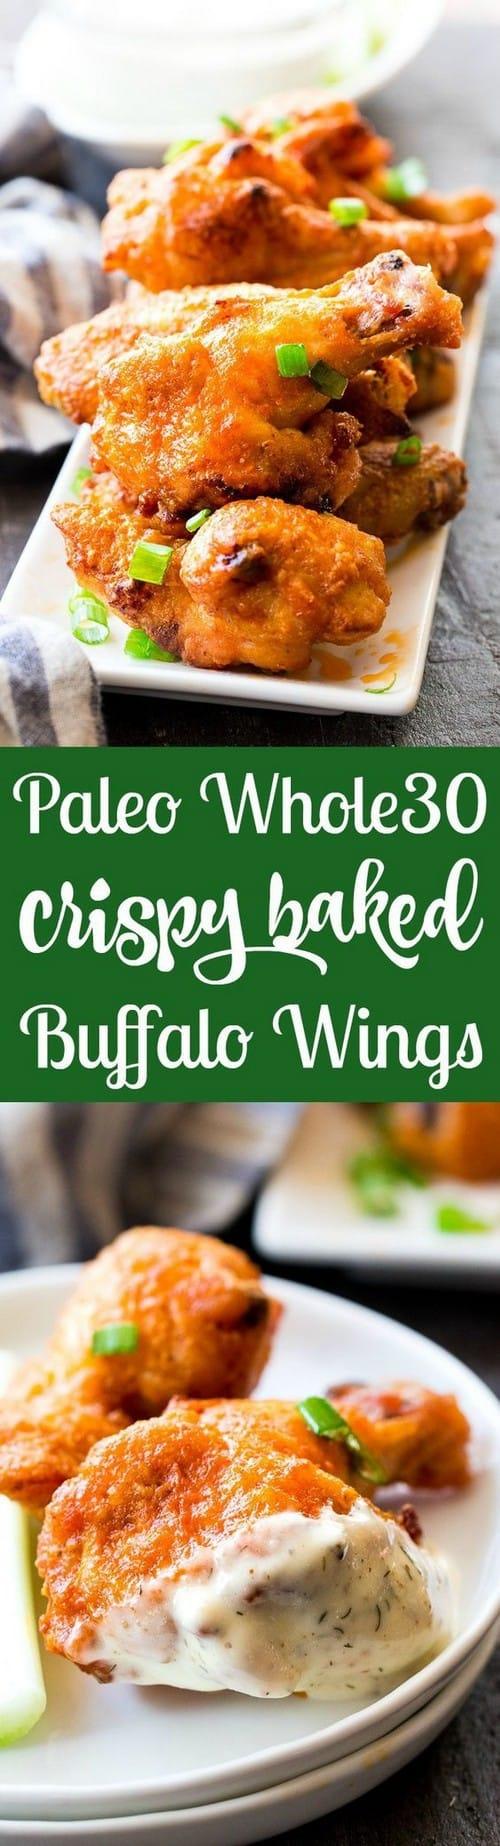 Paleo & Whole30 Crispy Baked Buffalo Wings